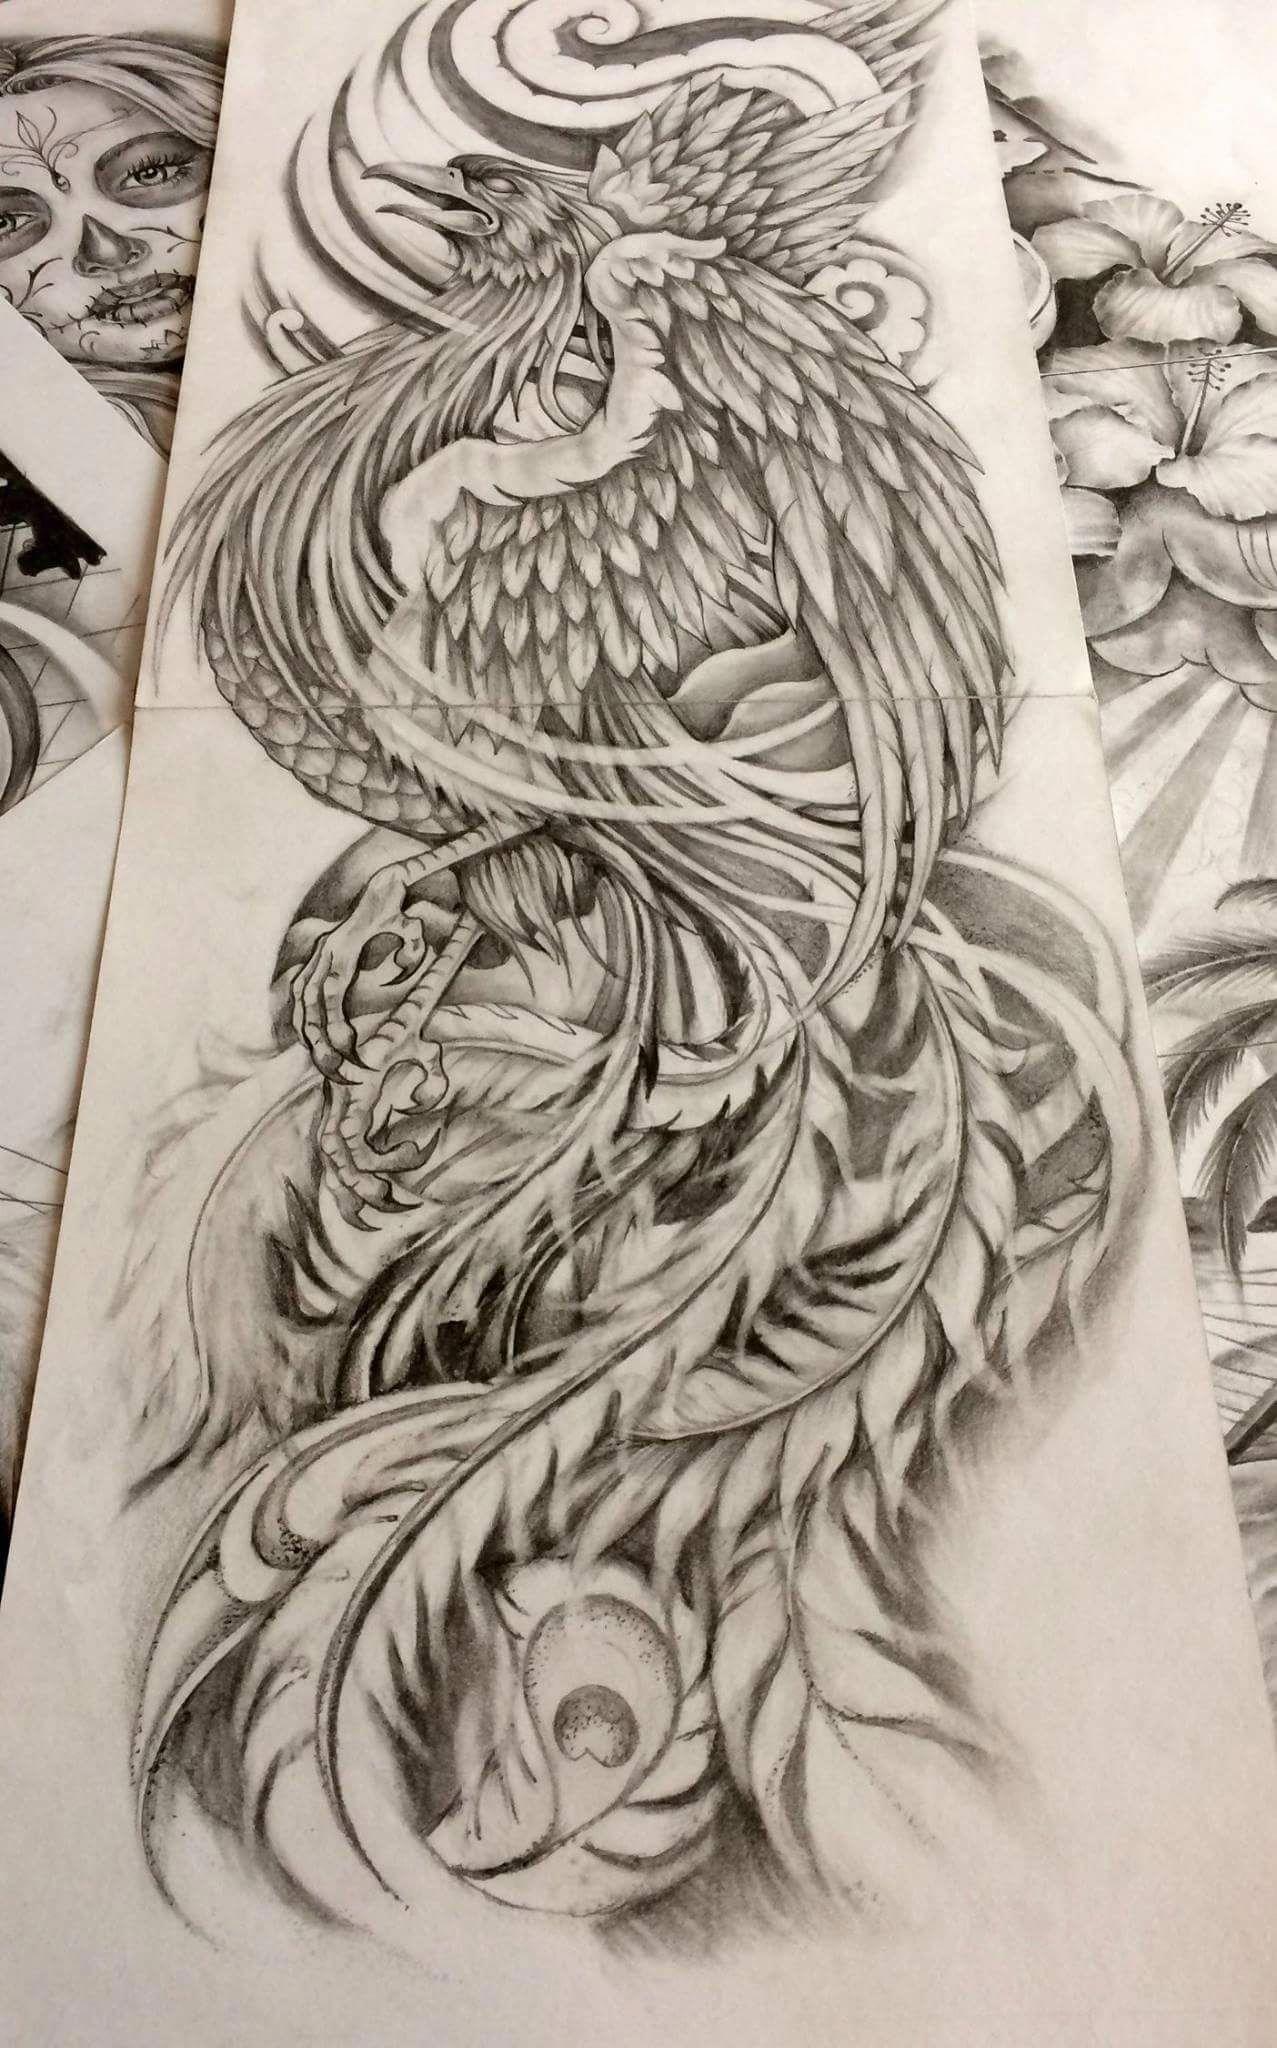 Phượng Hoang Japanesetattoos Backtattoos In 2020 Japanese Tattoo Tattoo Design Drawings Phoenix Tattoo